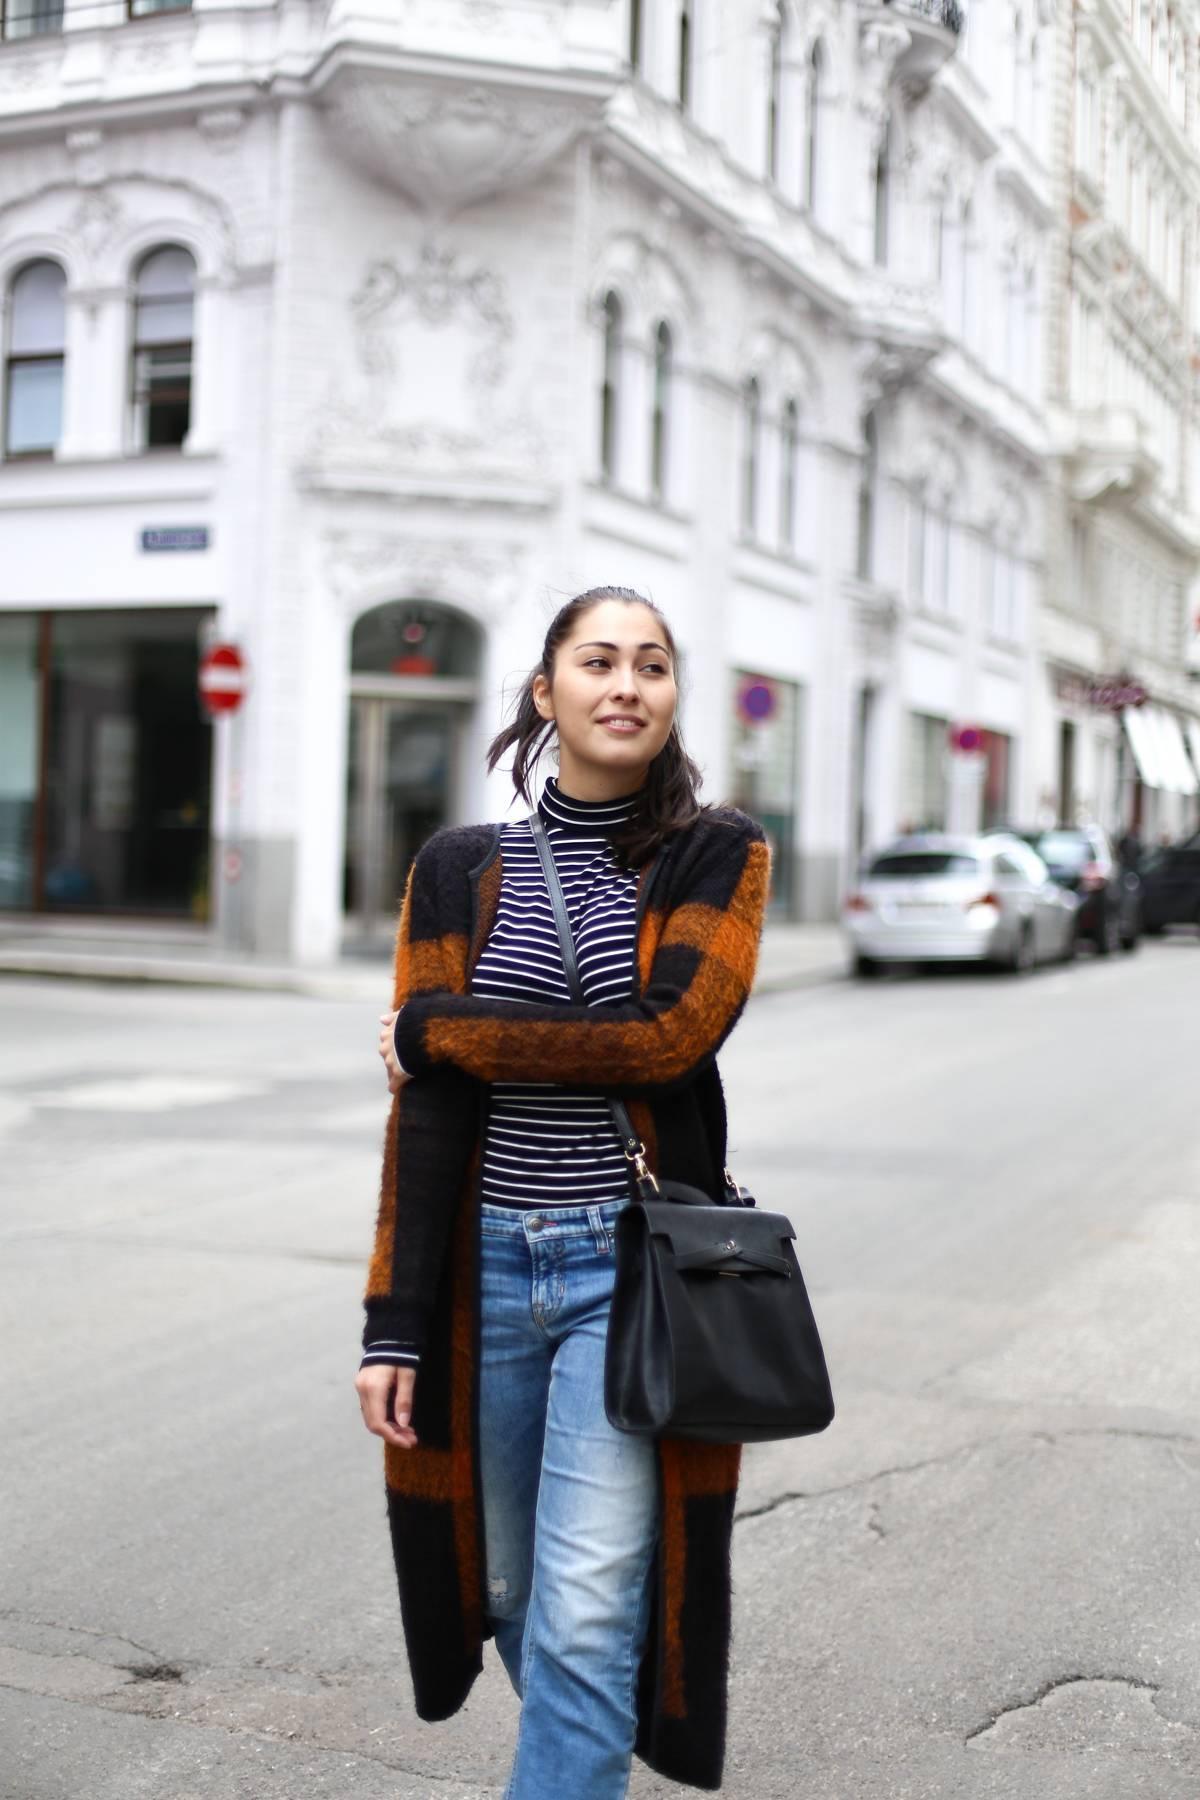 streetstyle wien - vienna - german fashionblog - travelblog - ootd - casual - superga white - rené lezard coat - turtleneck - rollkragen